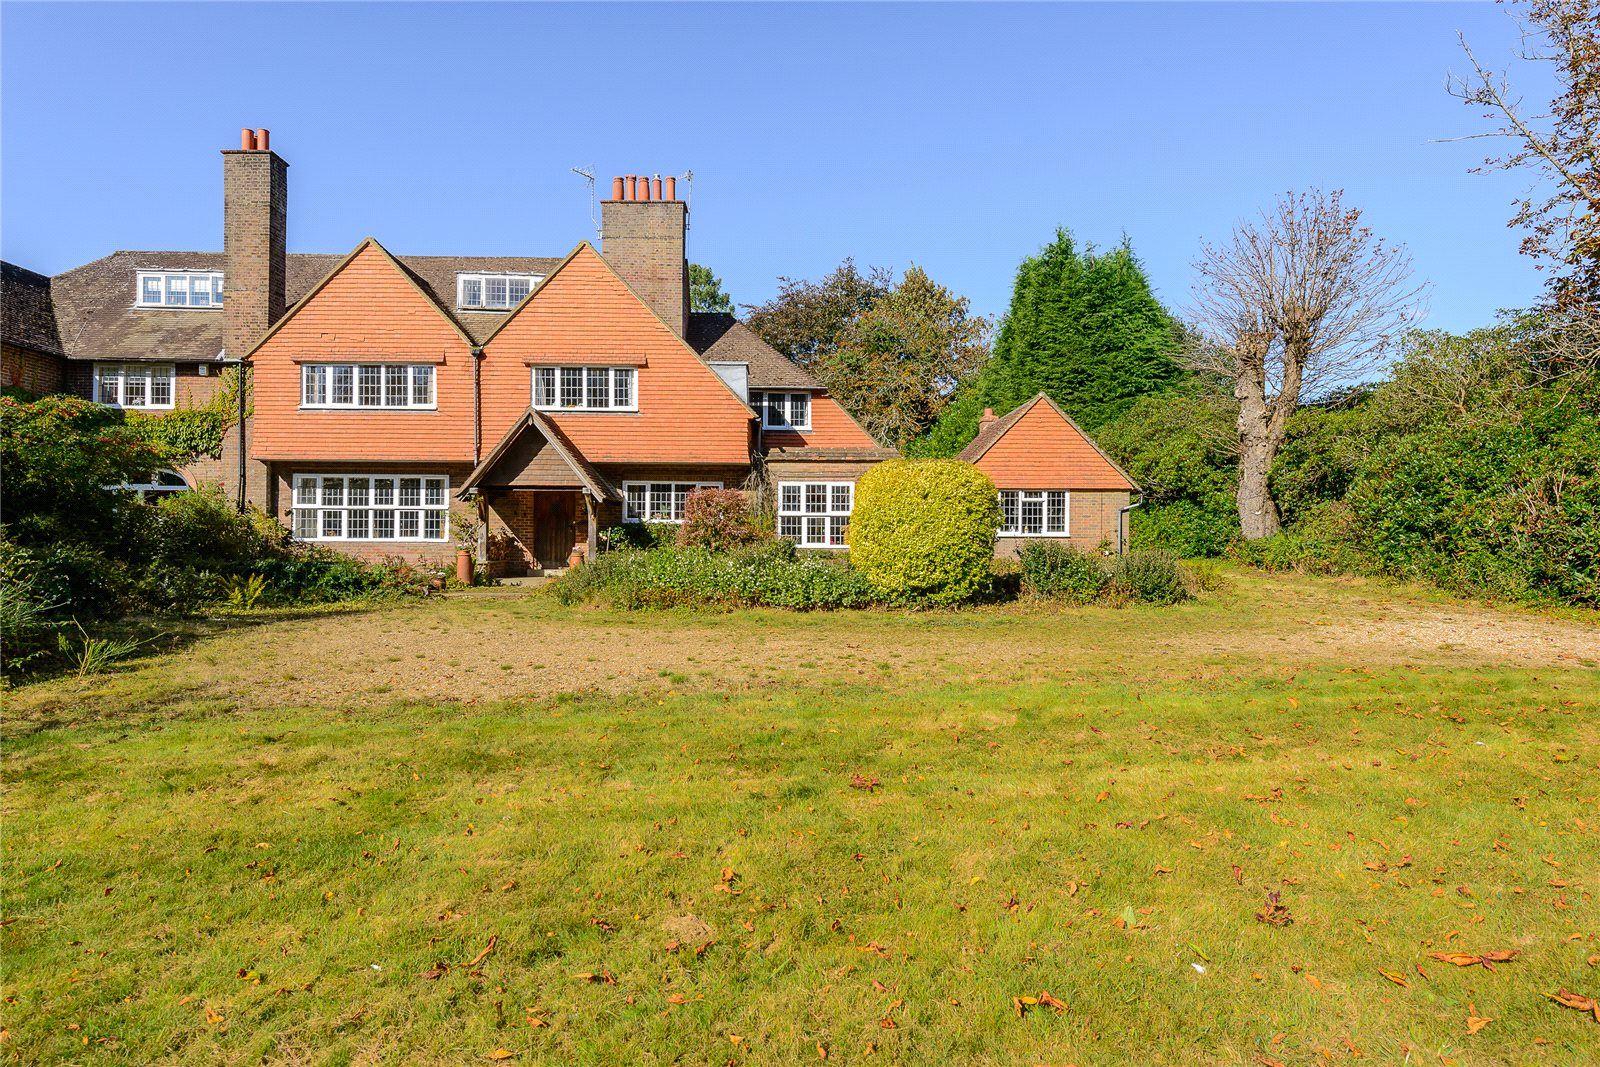 Villa per Vendita alle ore Weydown Road, Haslemere, Surrey, GU27 Haslemere, Inghilterra